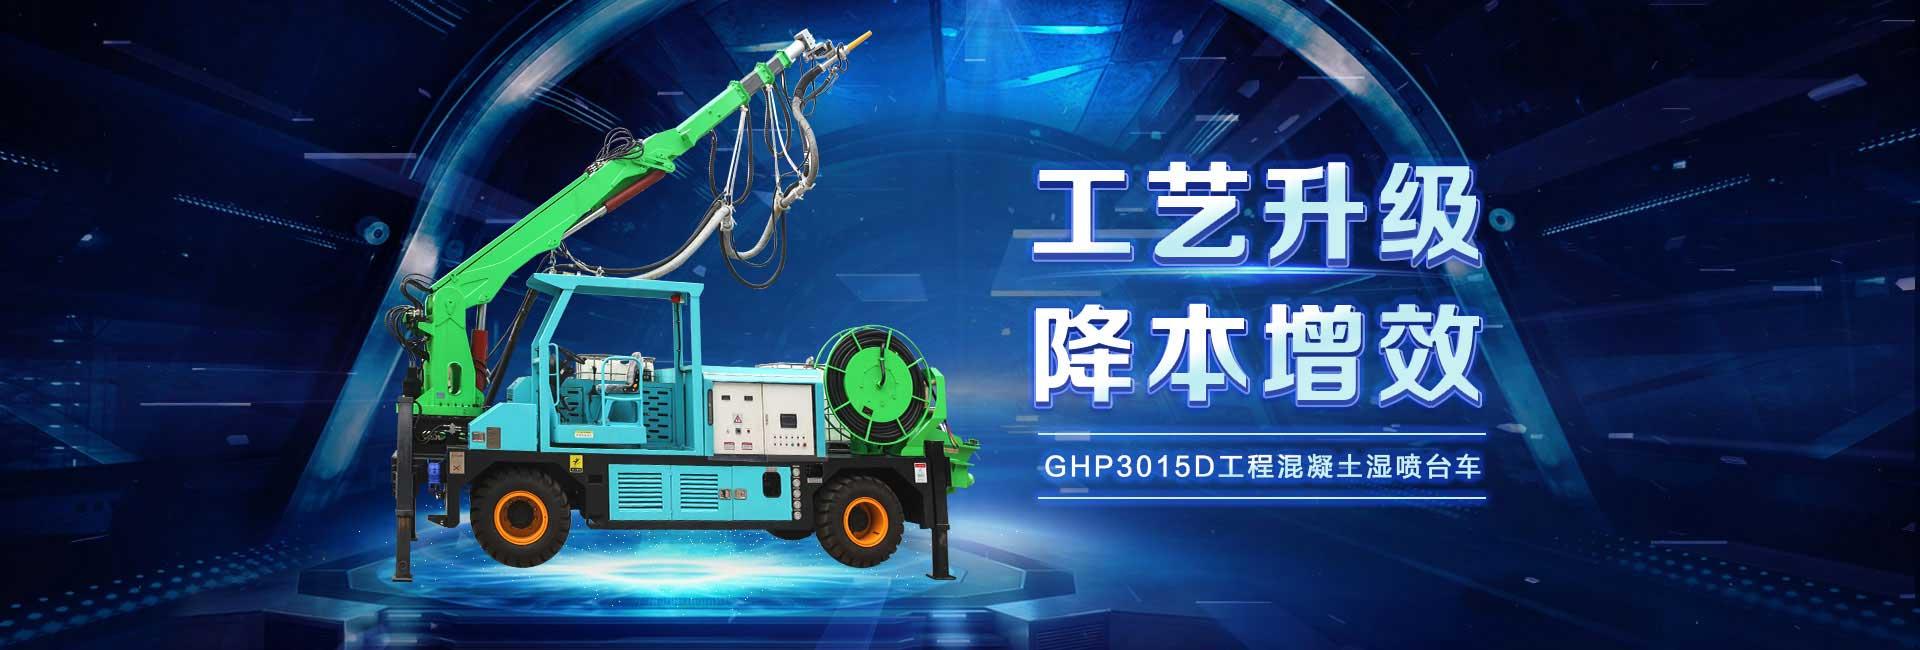 GHP3015工程混凝土湿喷台车